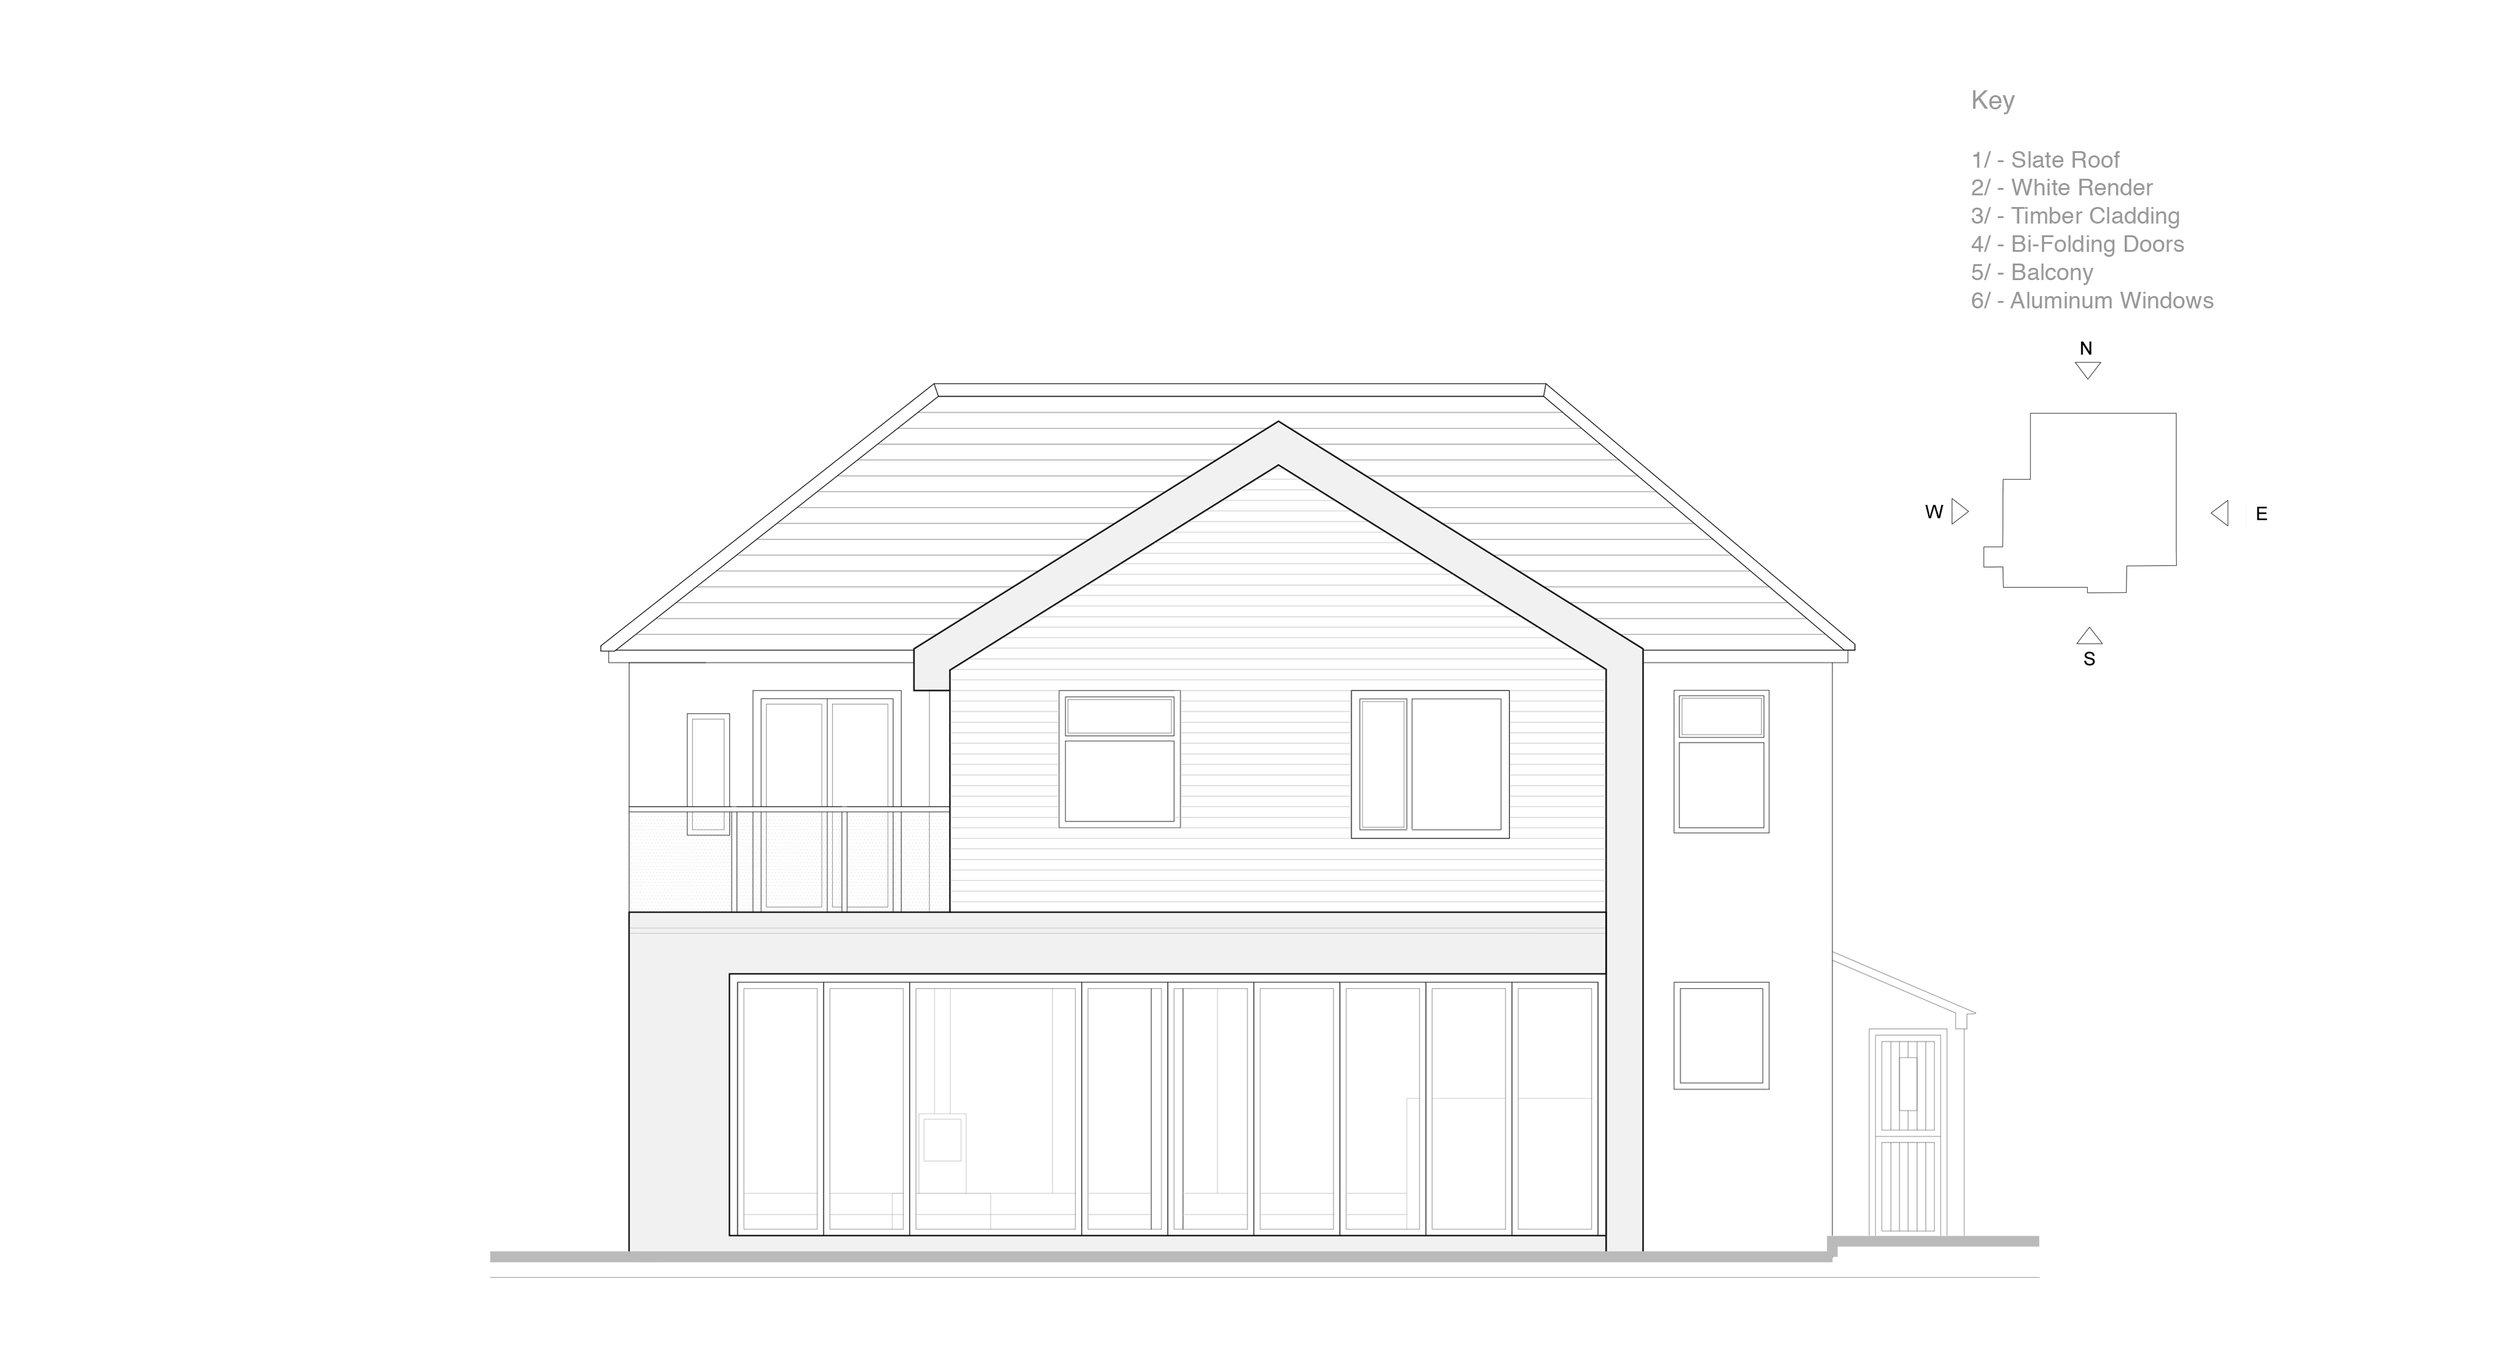 Castleview - Proposed Rear Elevation Plan.jpg